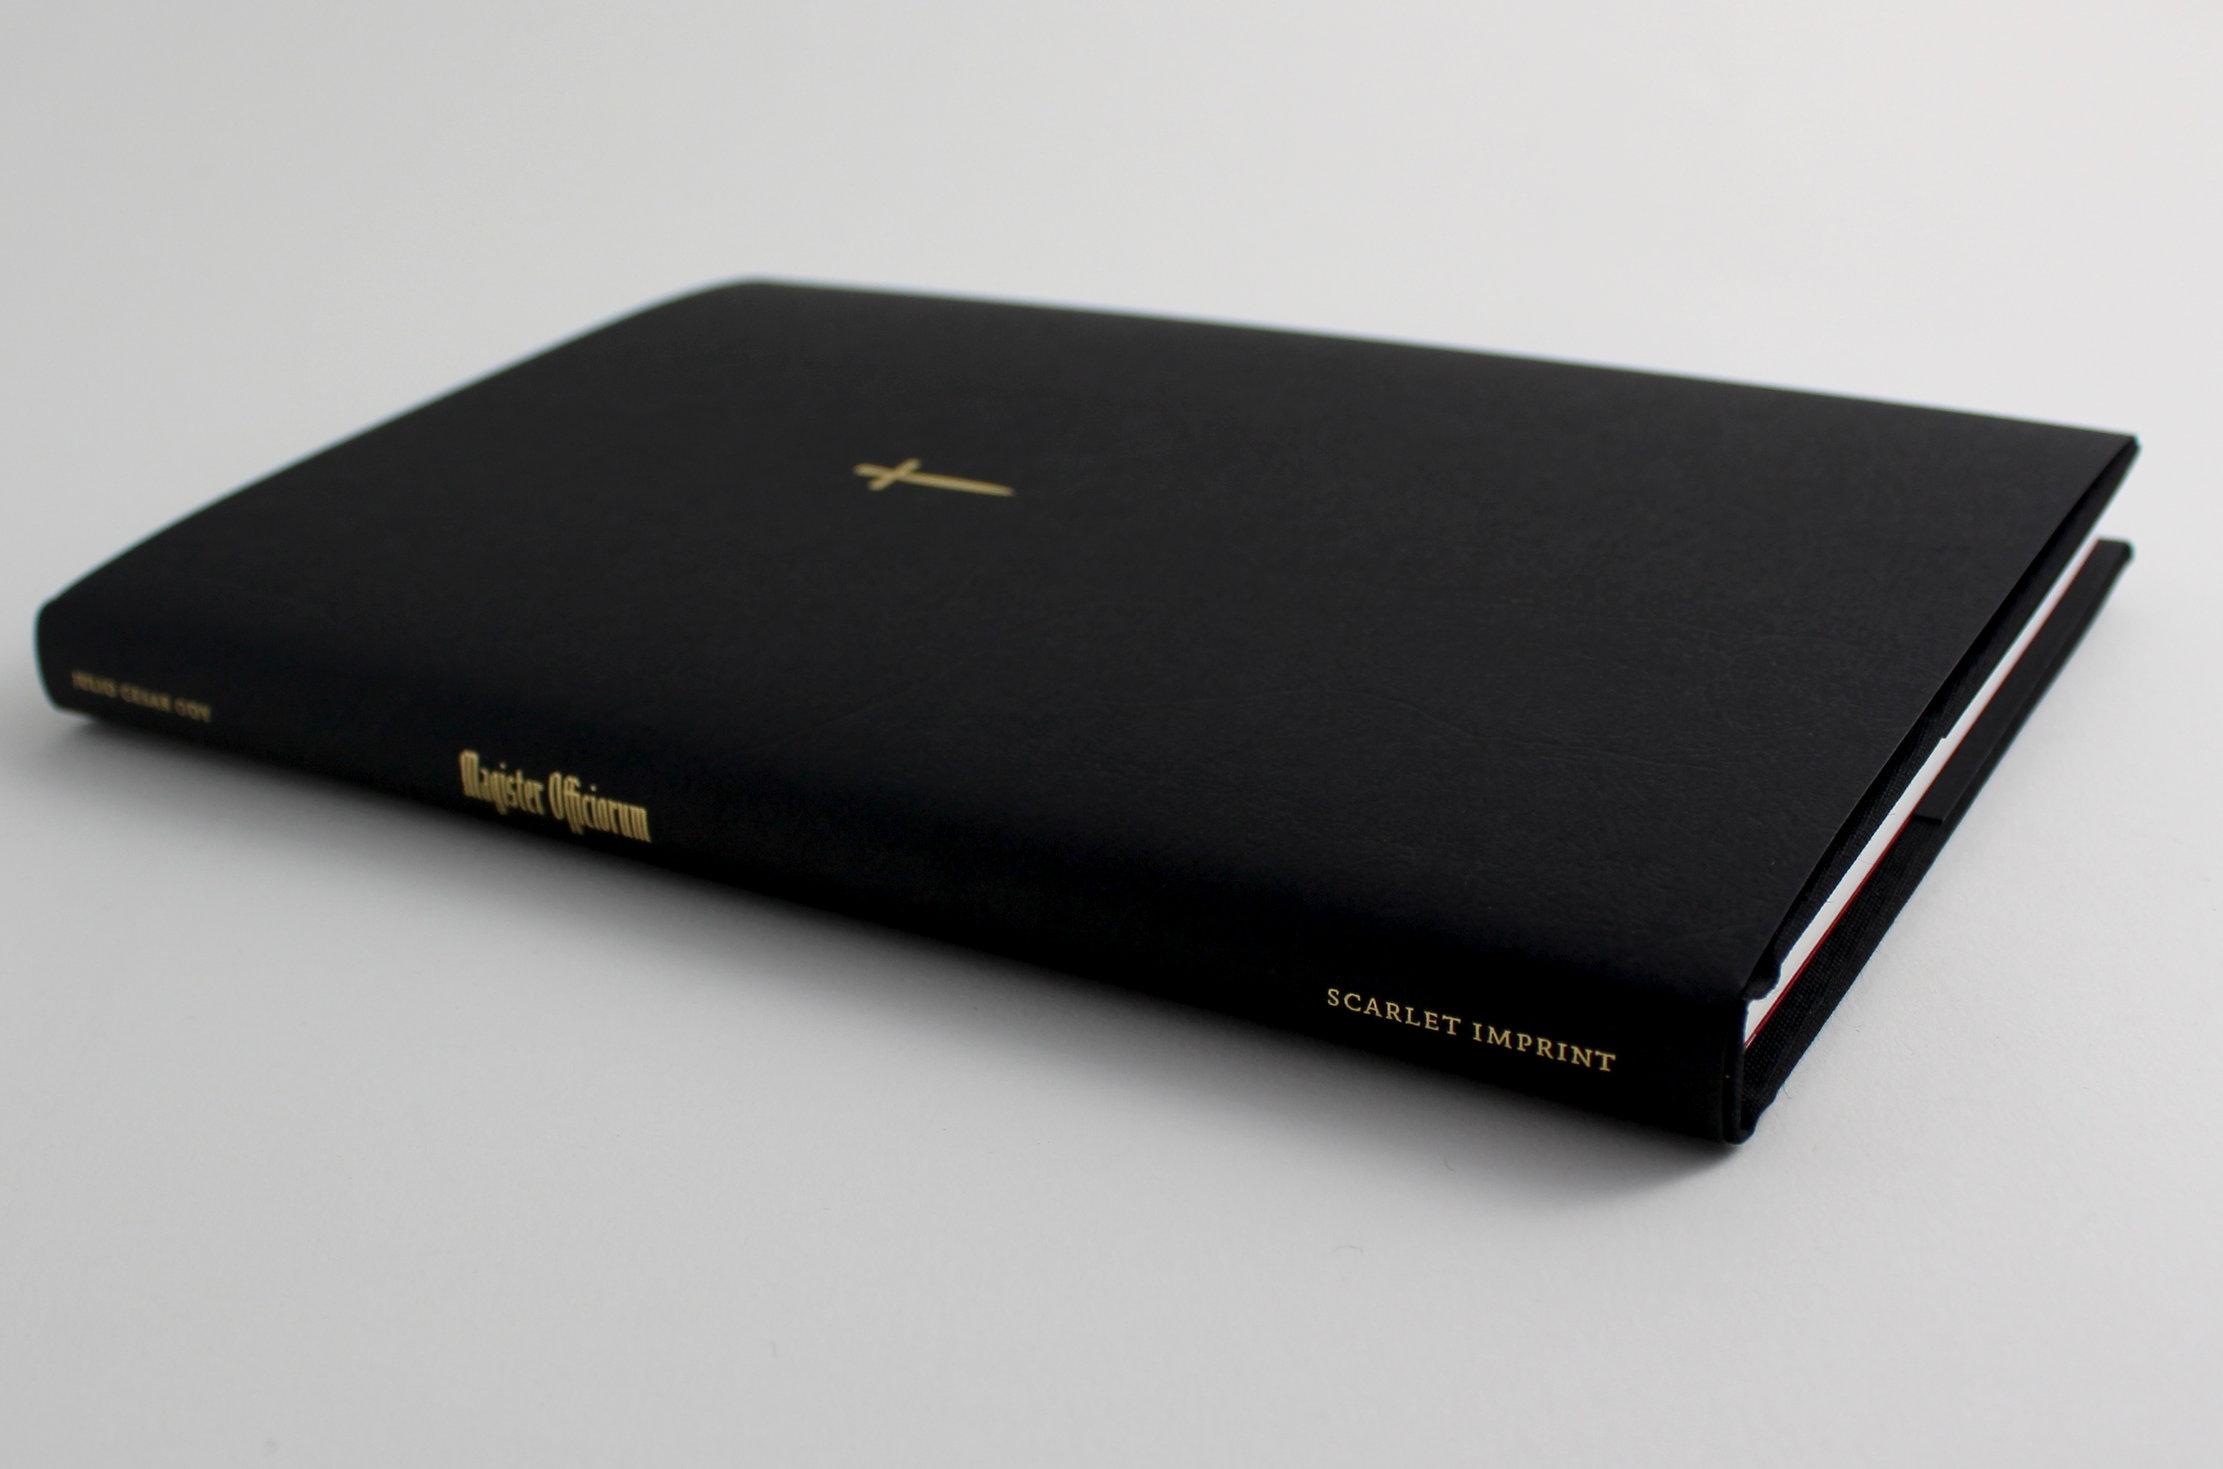 The standard hardback edition